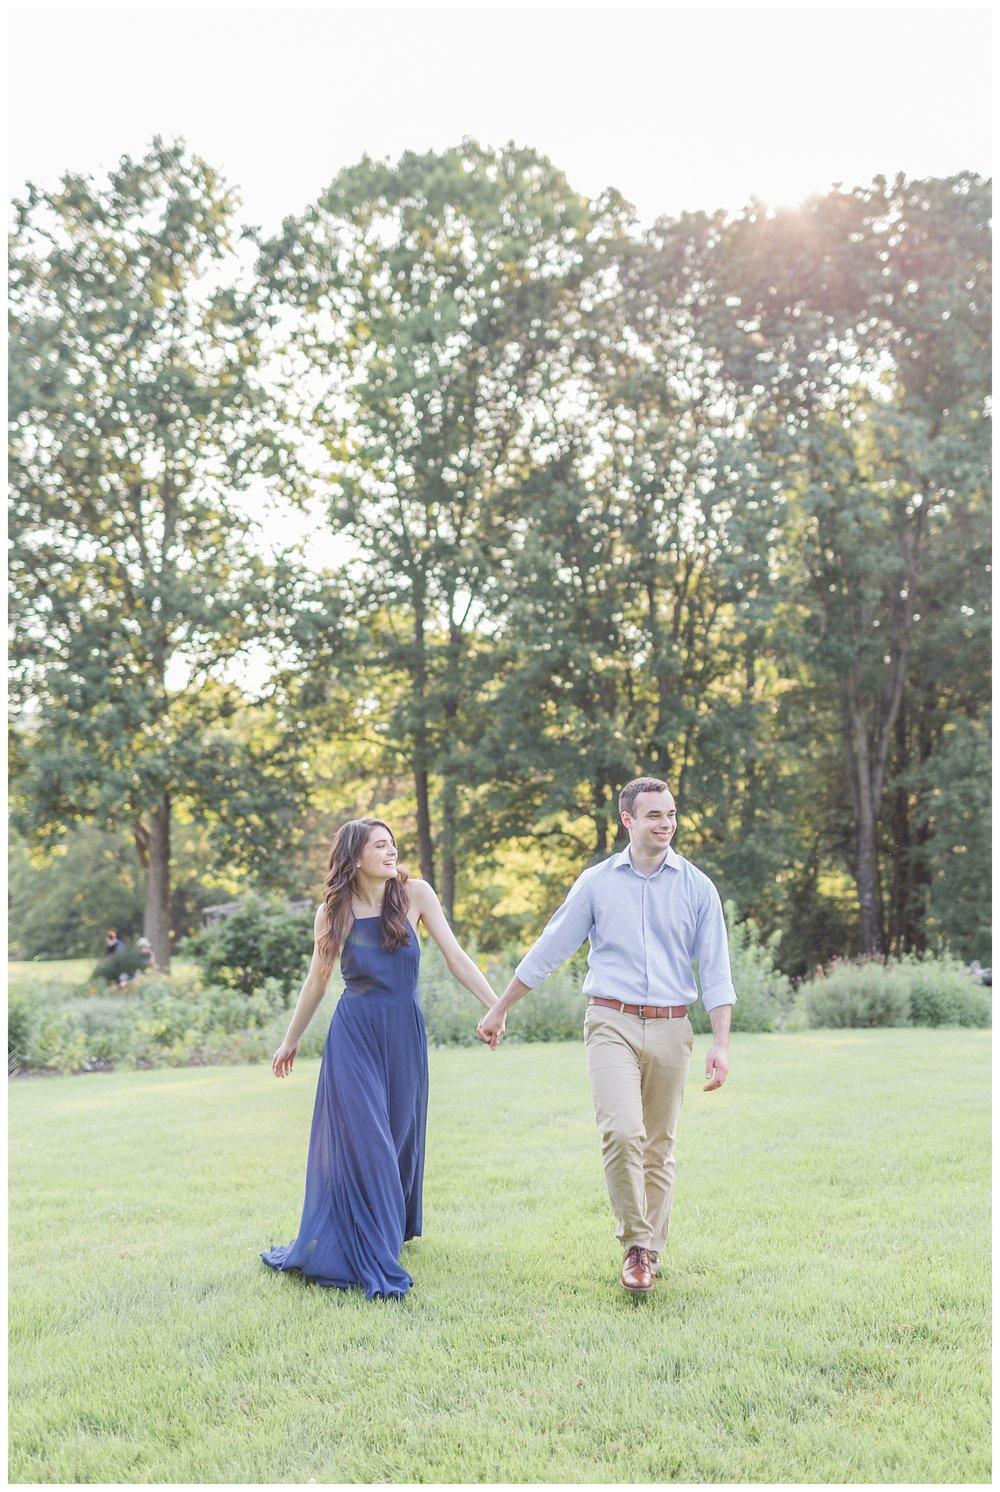 Meadowlark Botanical Garden Engagement | Virginia Wedding Photographer Kir Tuben_0031.jpg